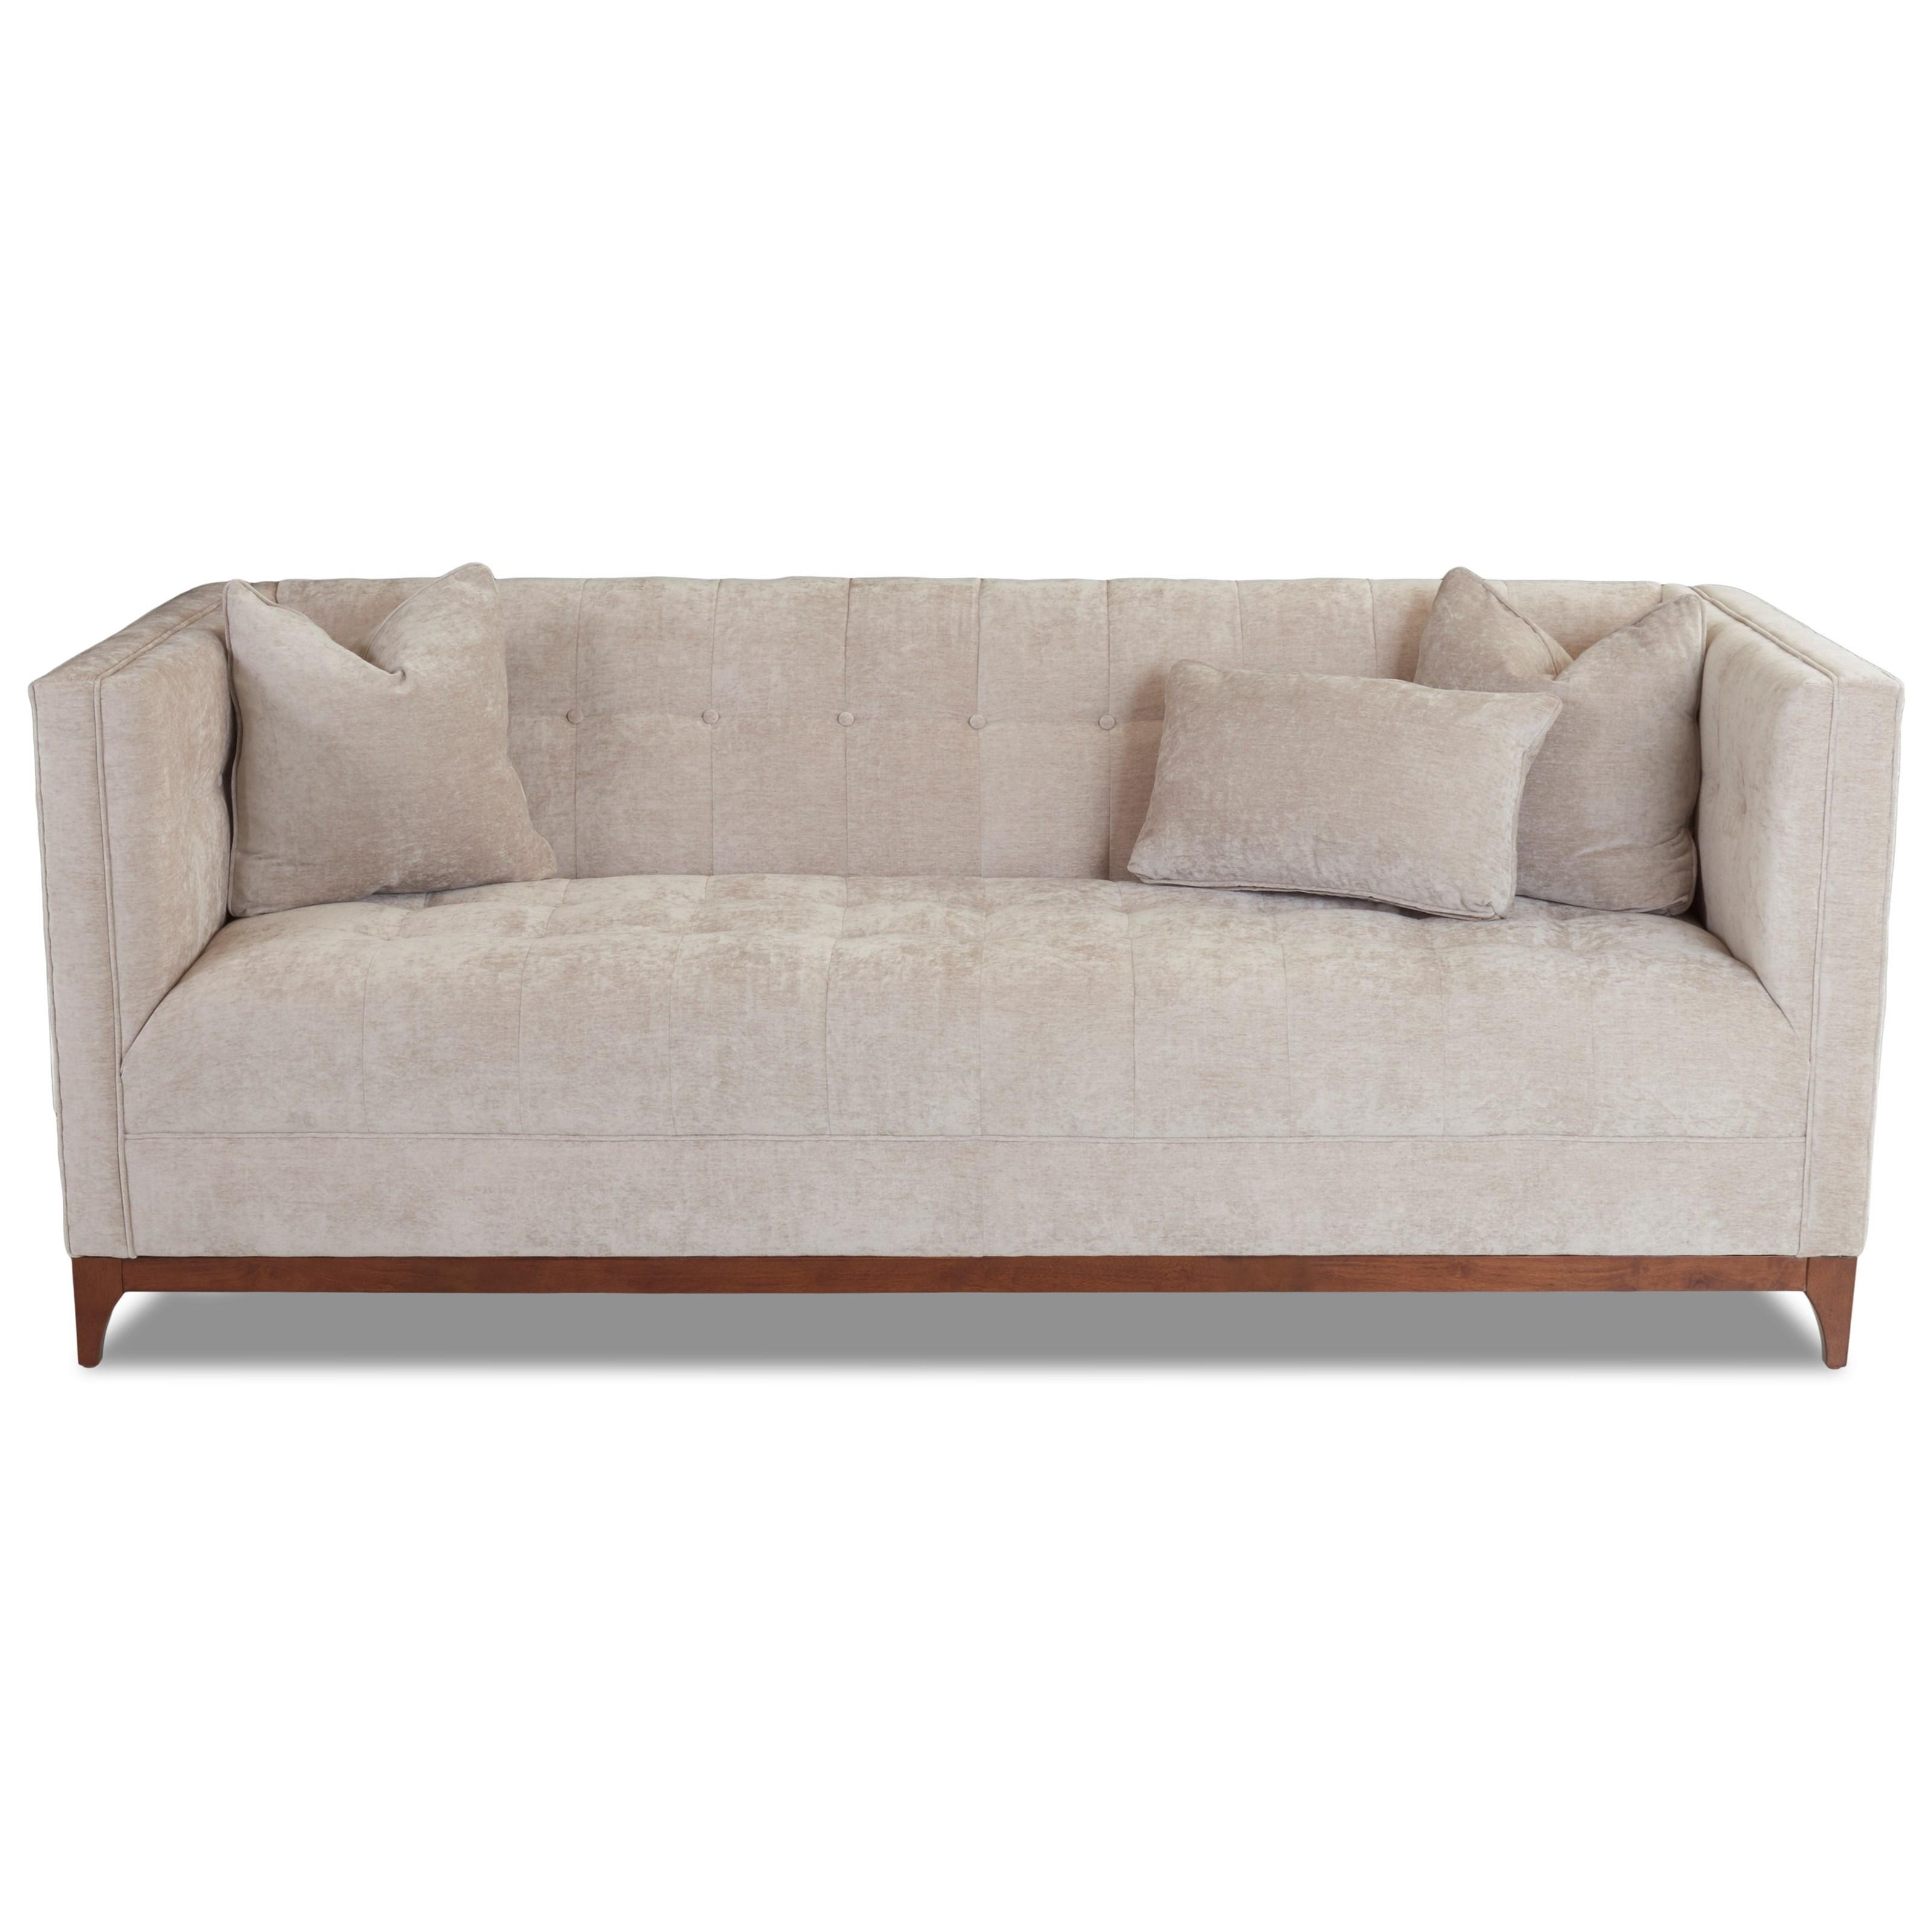 Contemporary Tuxedo Sofa by Klaussner